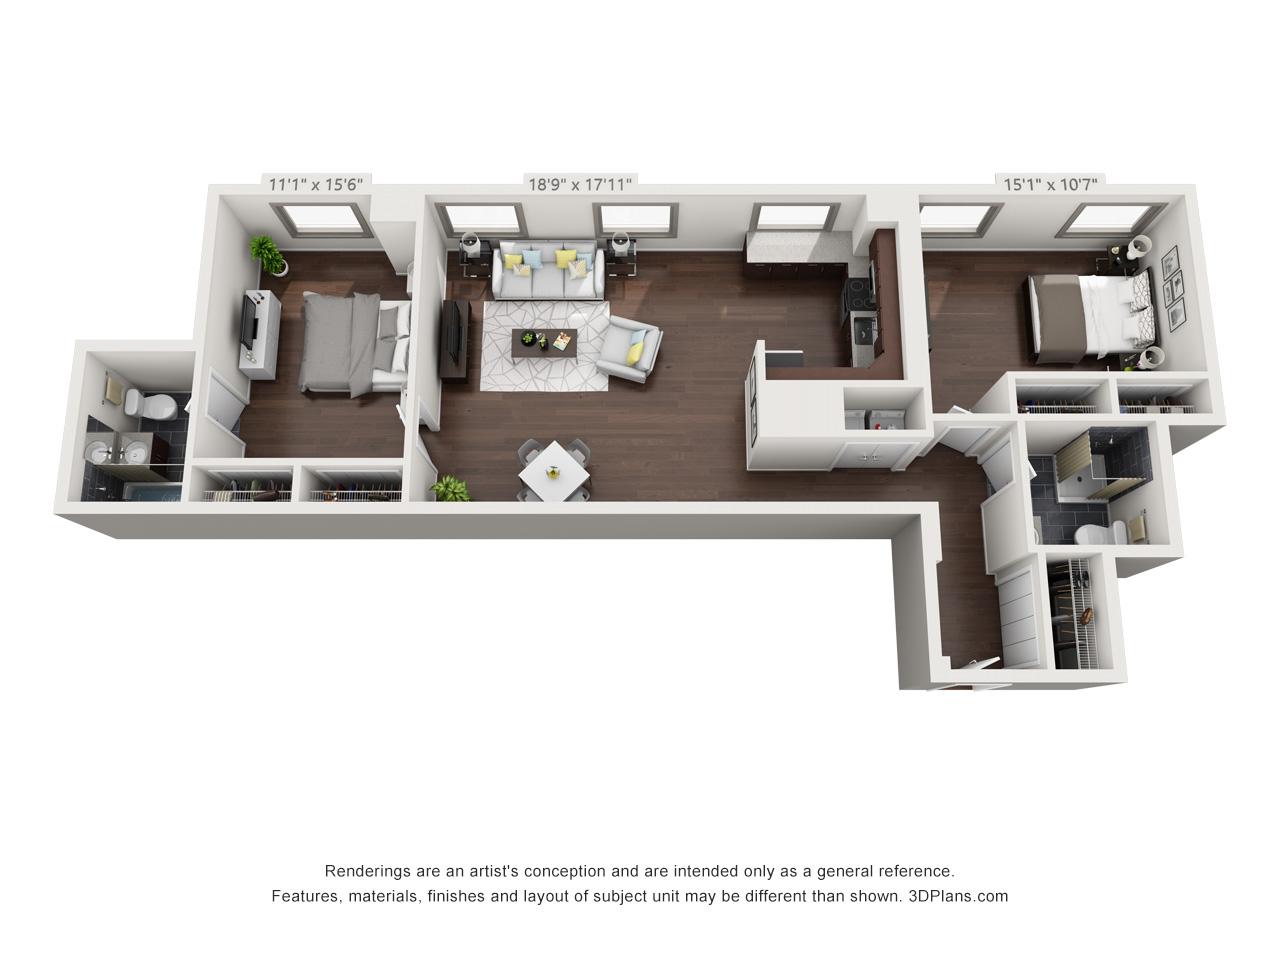 fairmount apartment community - 2 bedroom